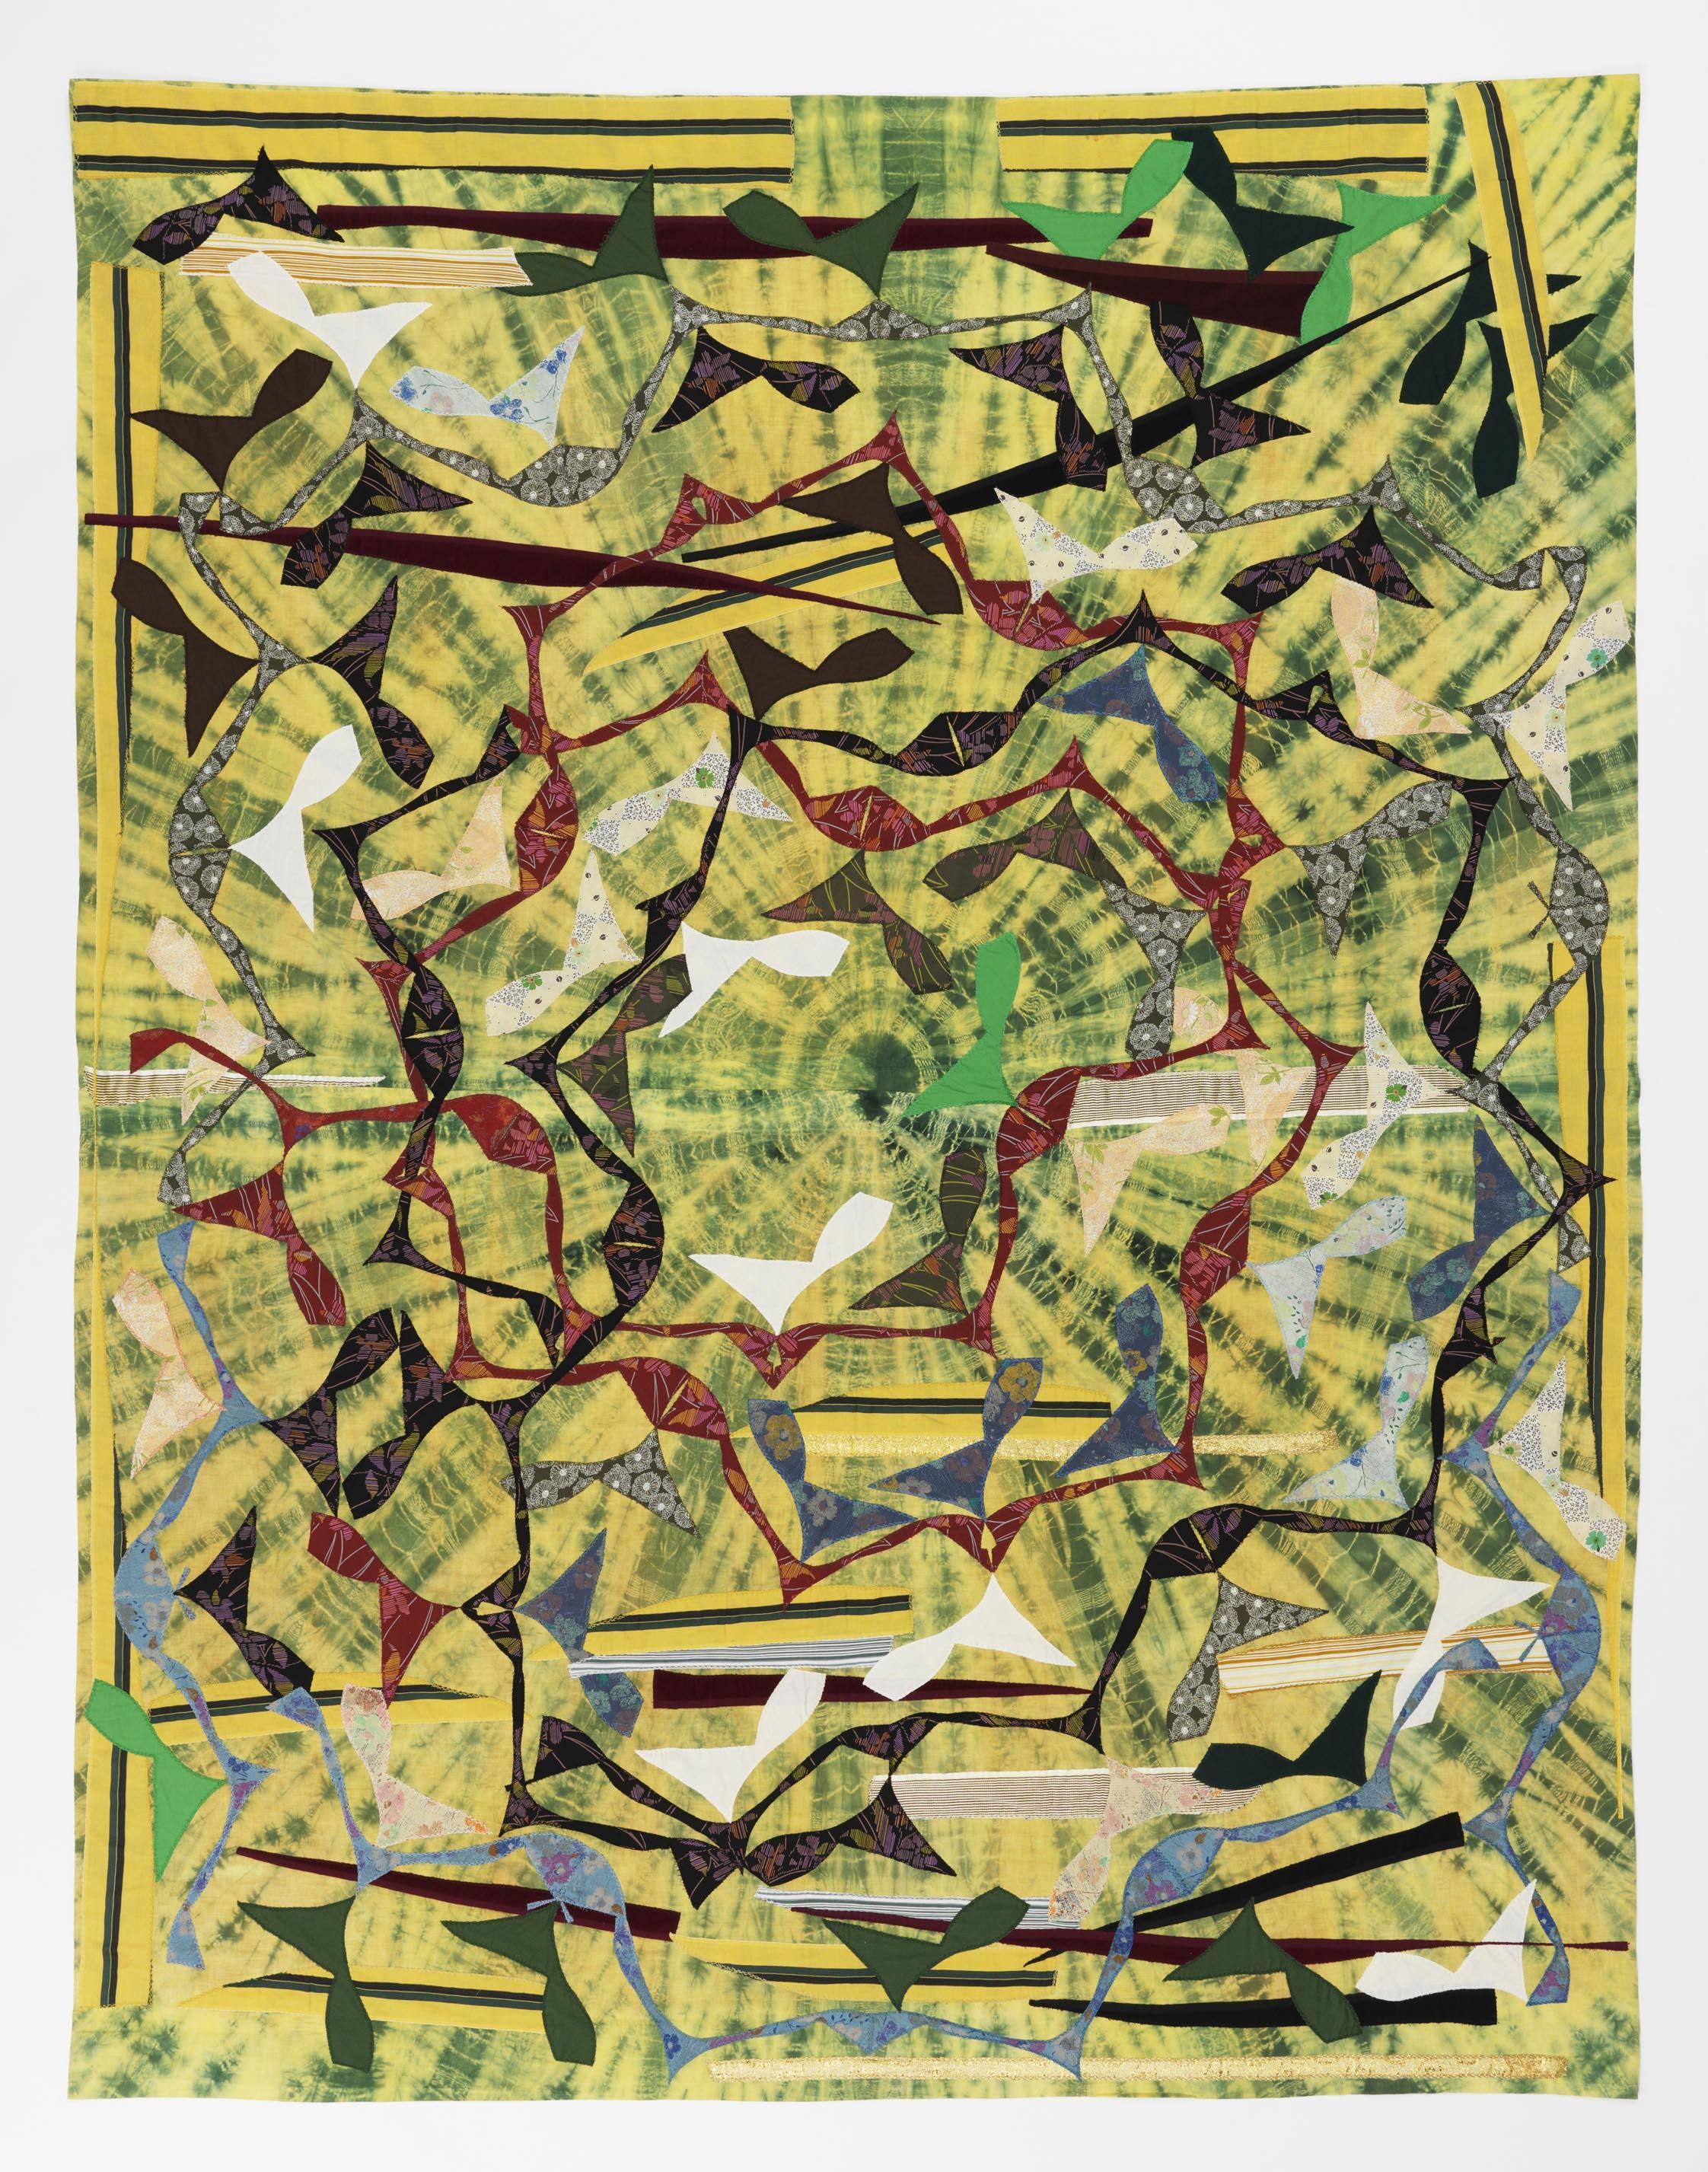 Noa Eshkol, <i>Insects in the Sun</i>, 1990. Foto: Jens Ziehe. Cortesia de The Noa Eshkol Foundation for Movement Notation, Holon, Israel, e neugerriemschneider, Berlim